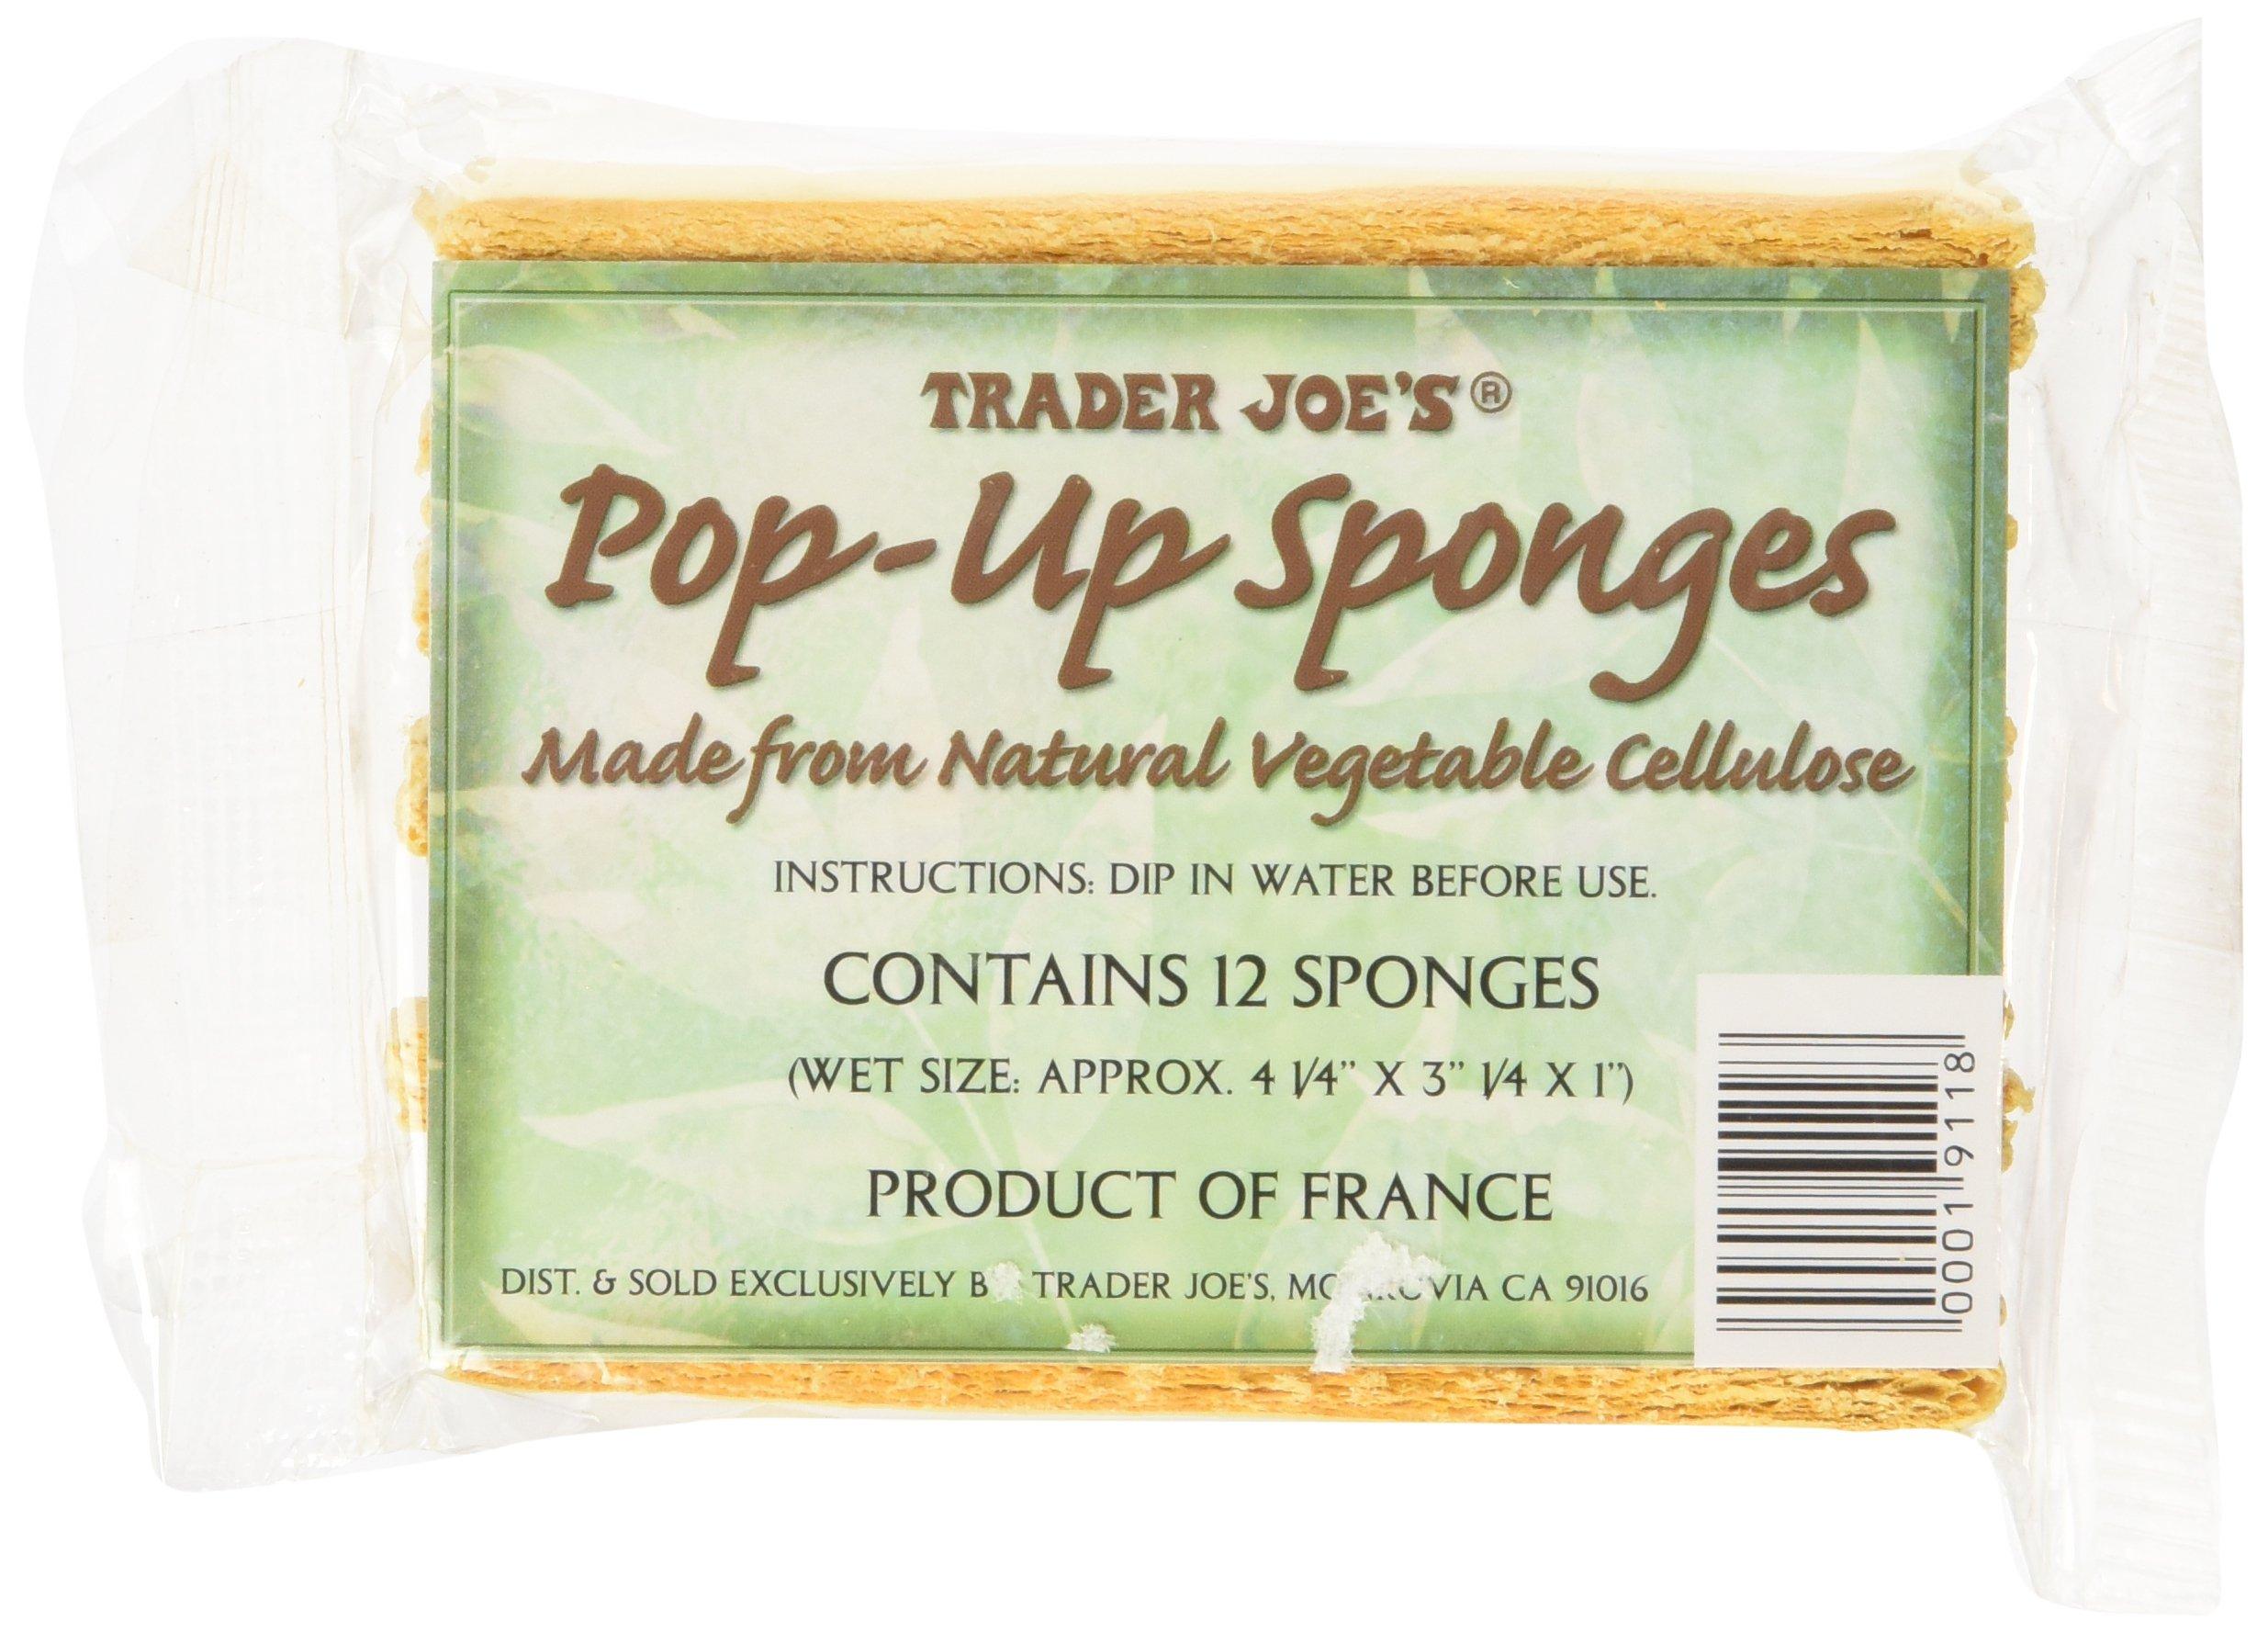 Trader Joe's Pop up Sponges Made From Natural Vegetable Cellulose